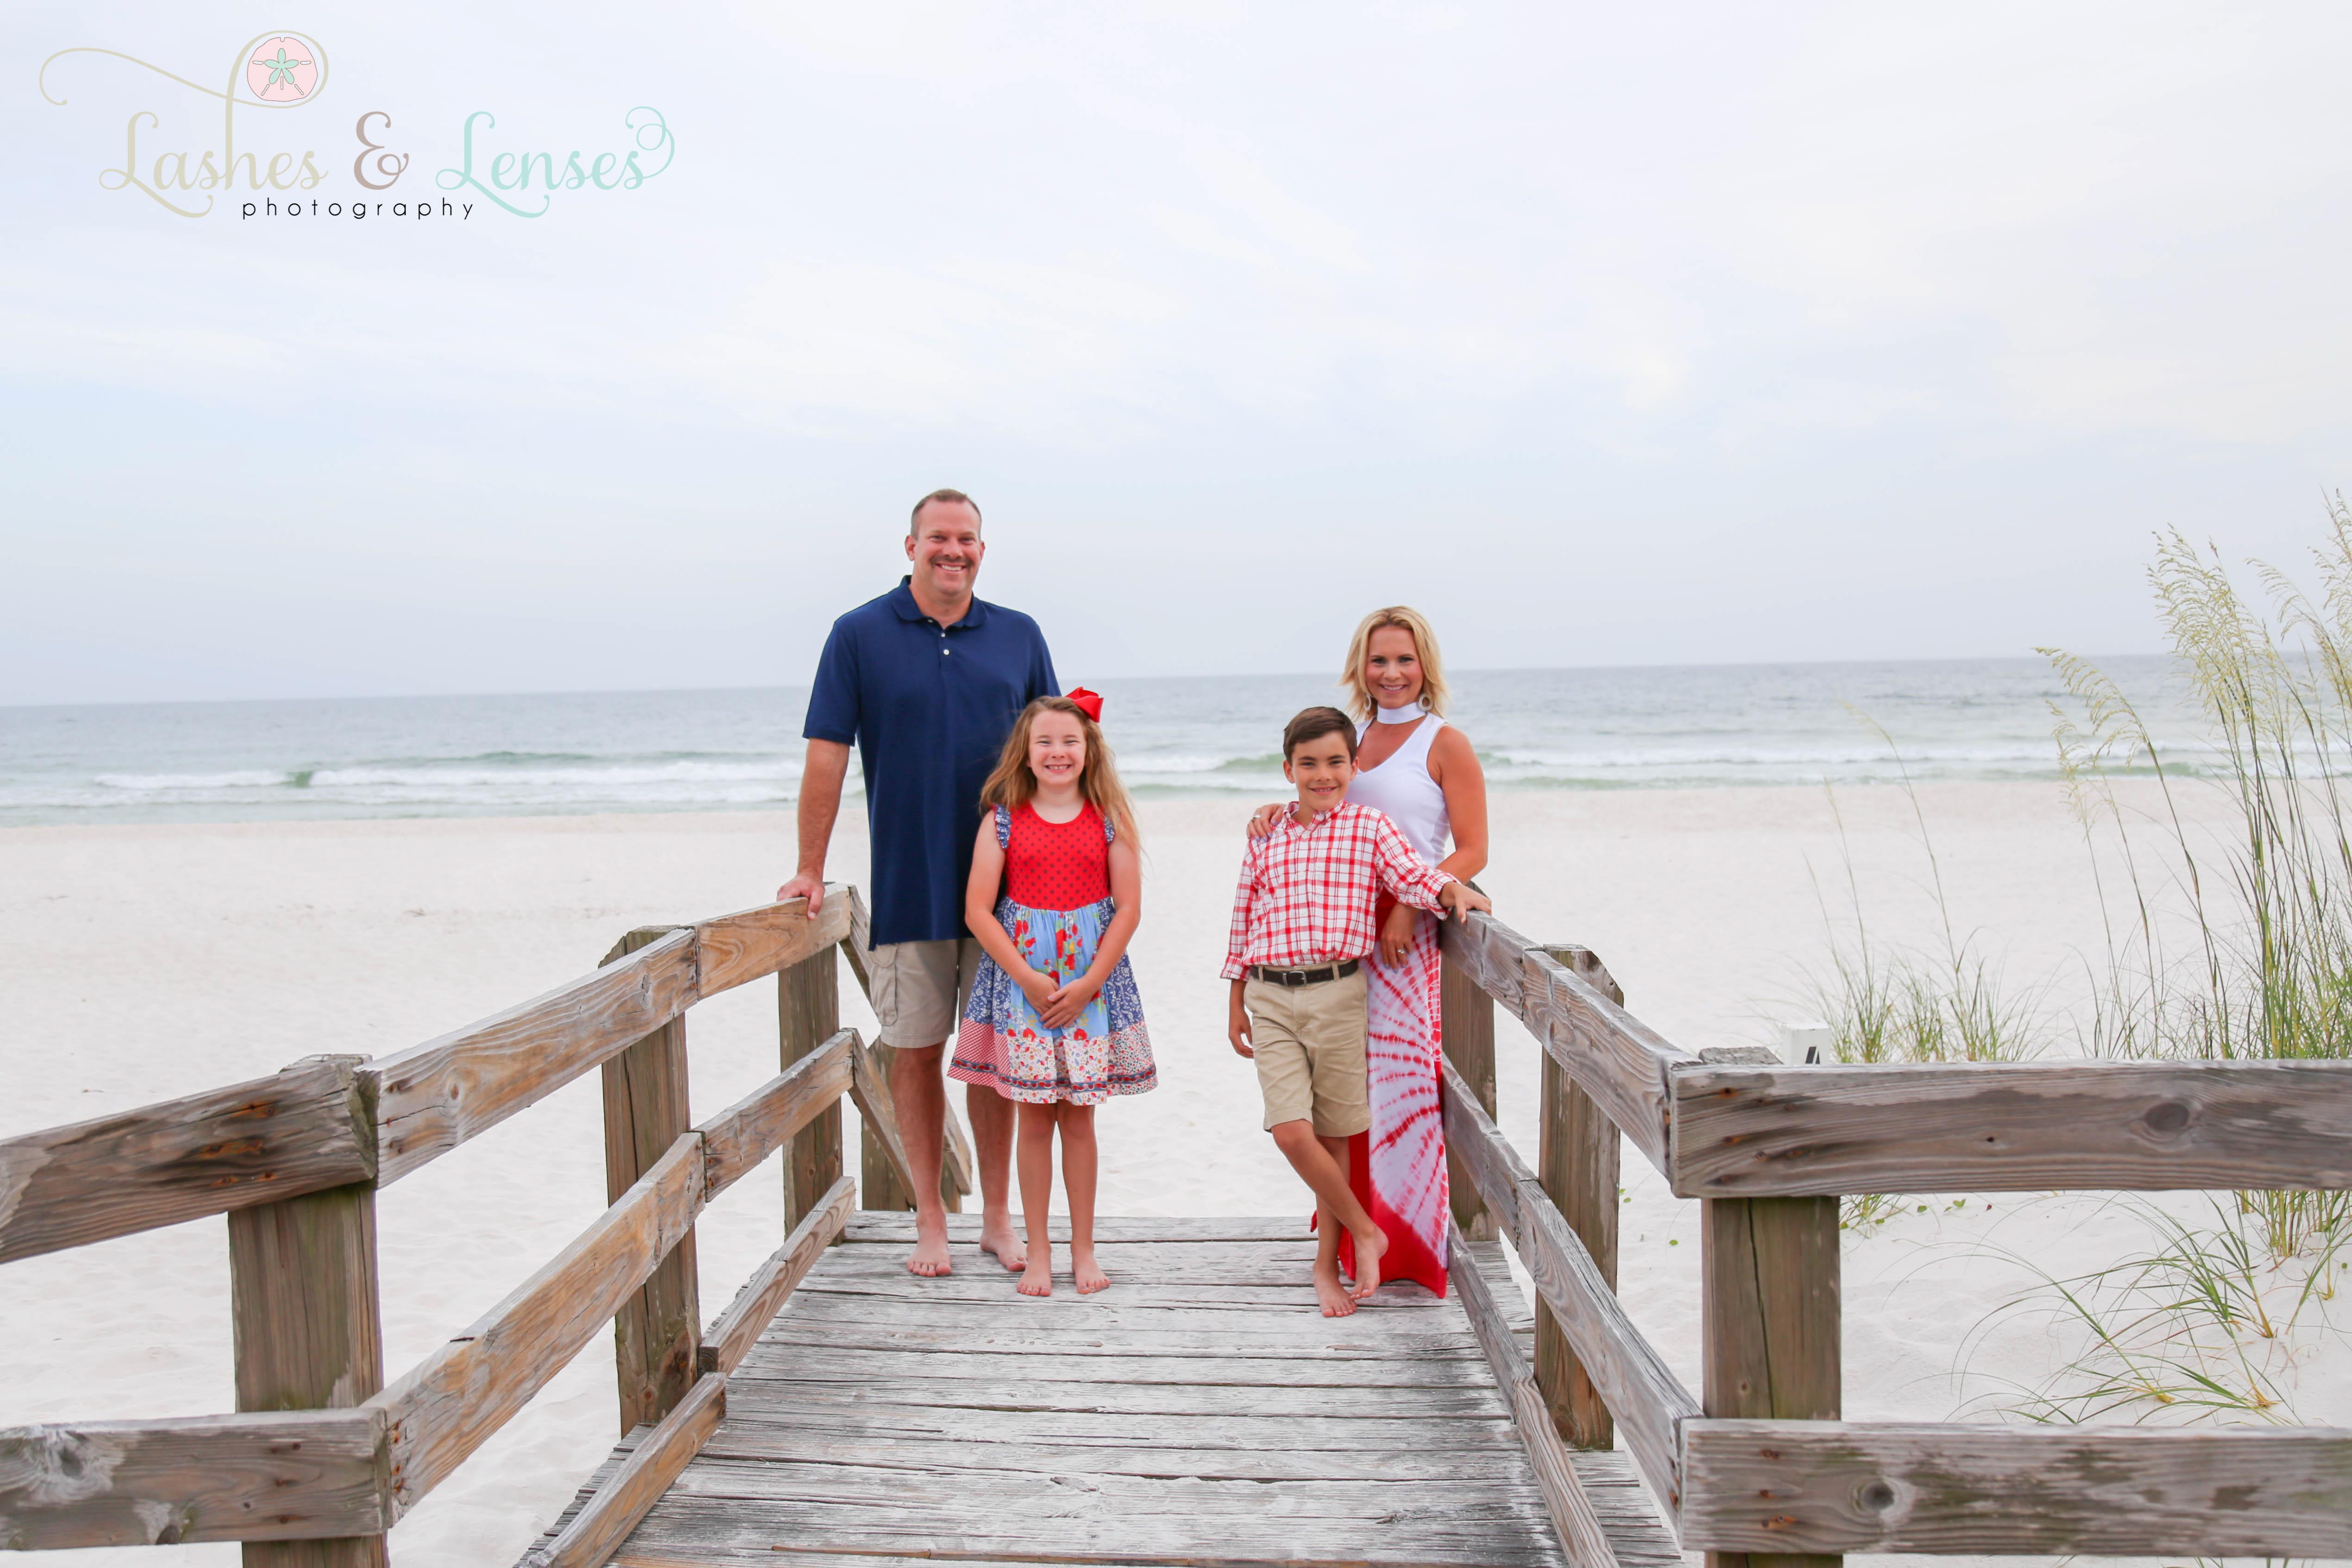 Family on boardwalk at Johnsons Beach Perdido Key Florida